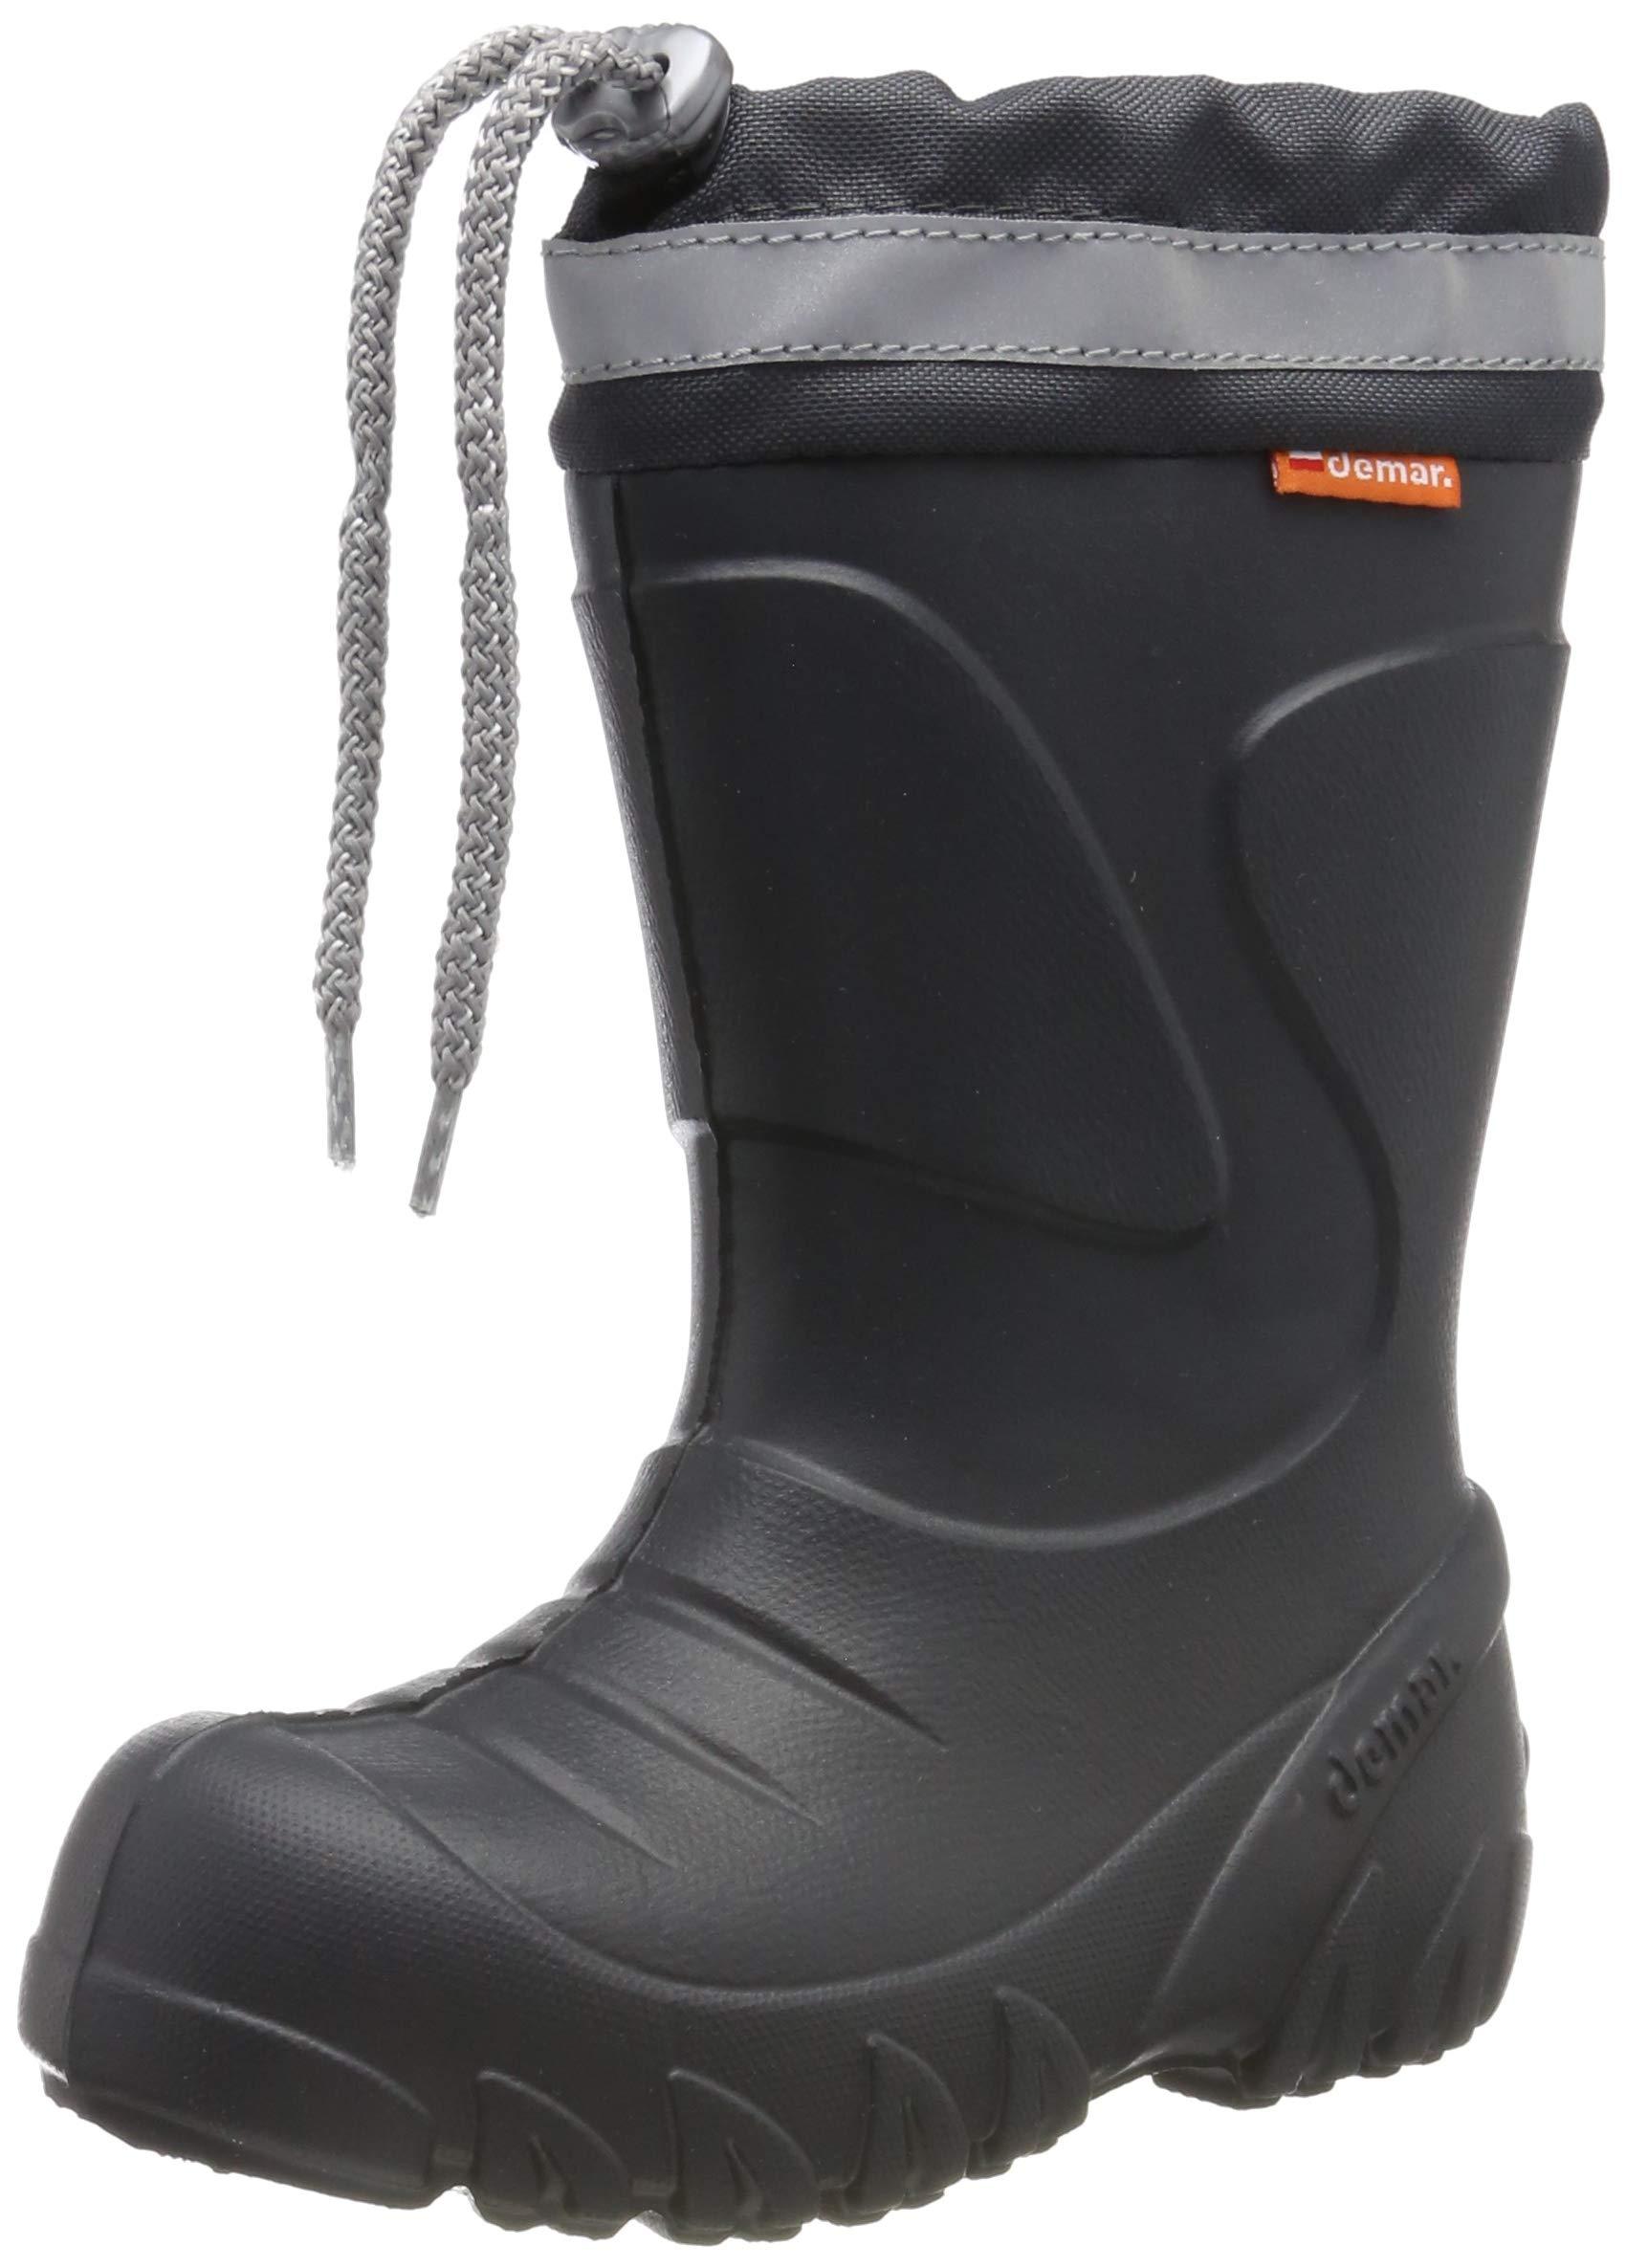 Demar. Girls Boots Grey Size: 11- Buy